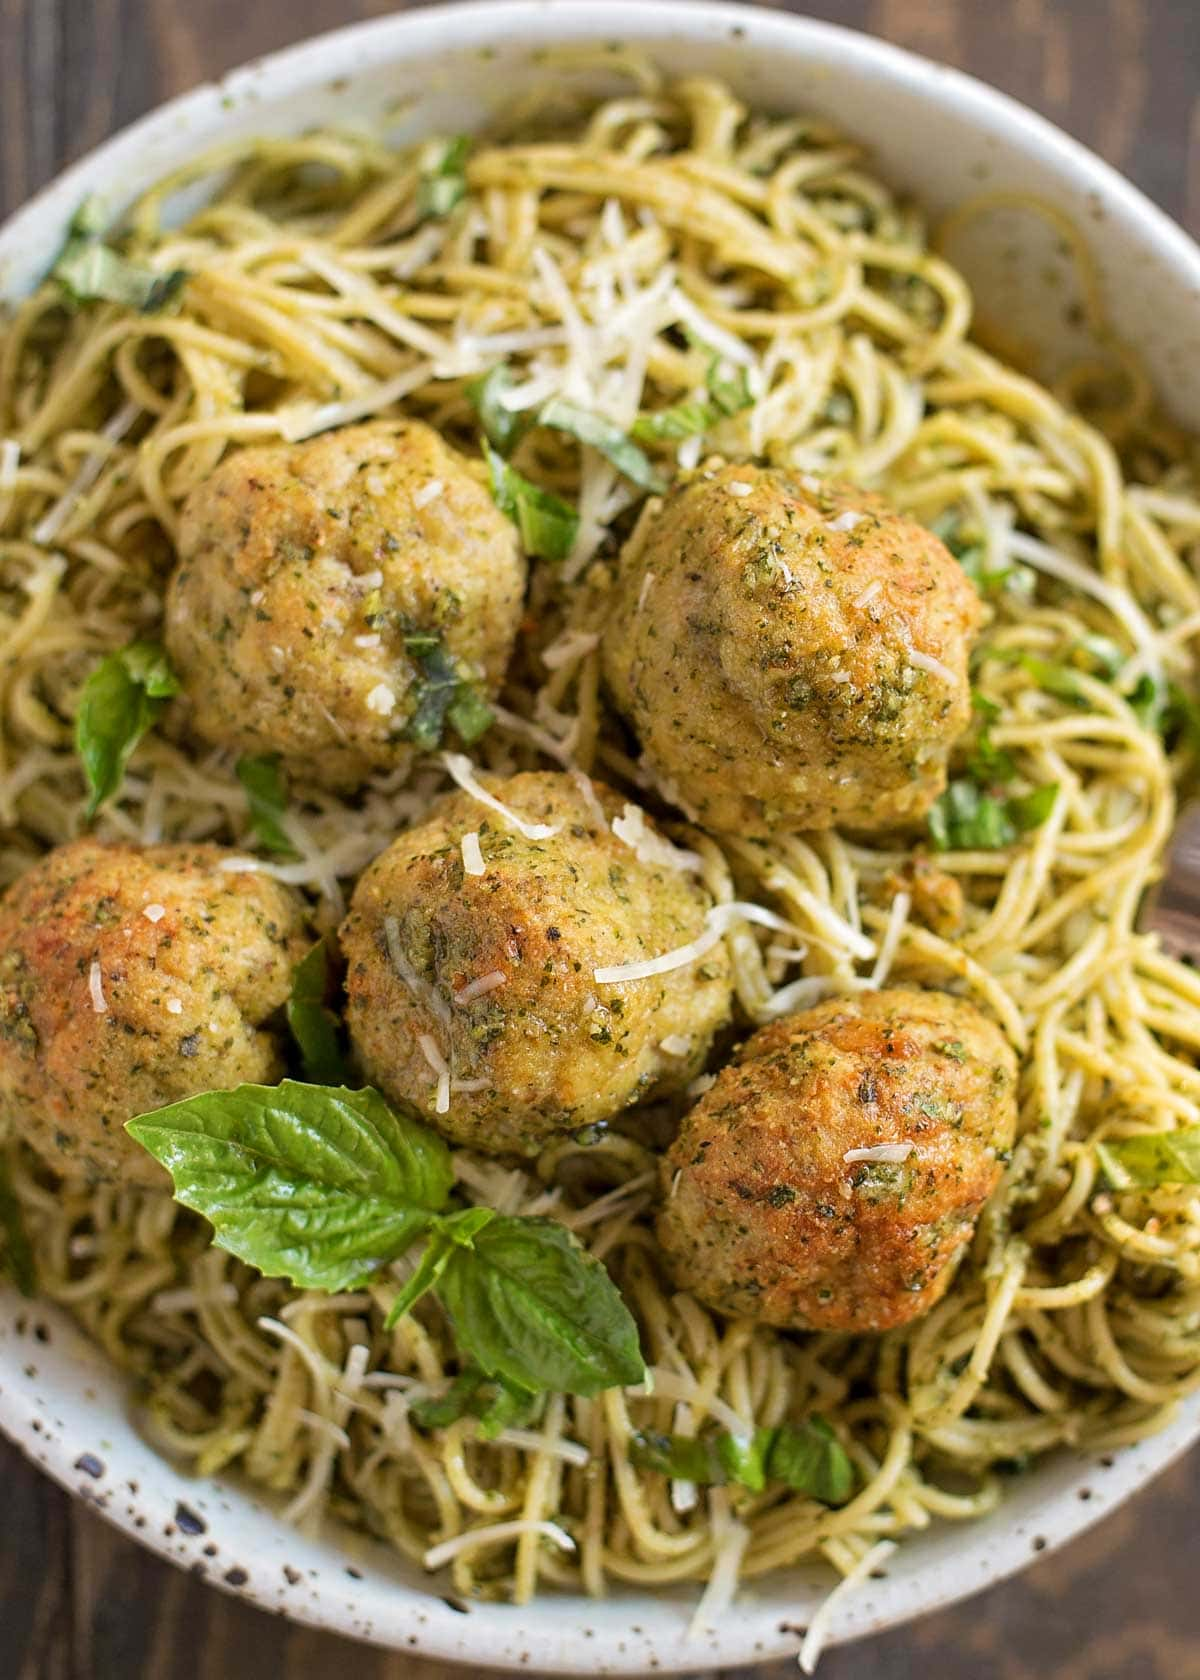 Pesto chicken meatballs on top of pesto pasta in a bowl